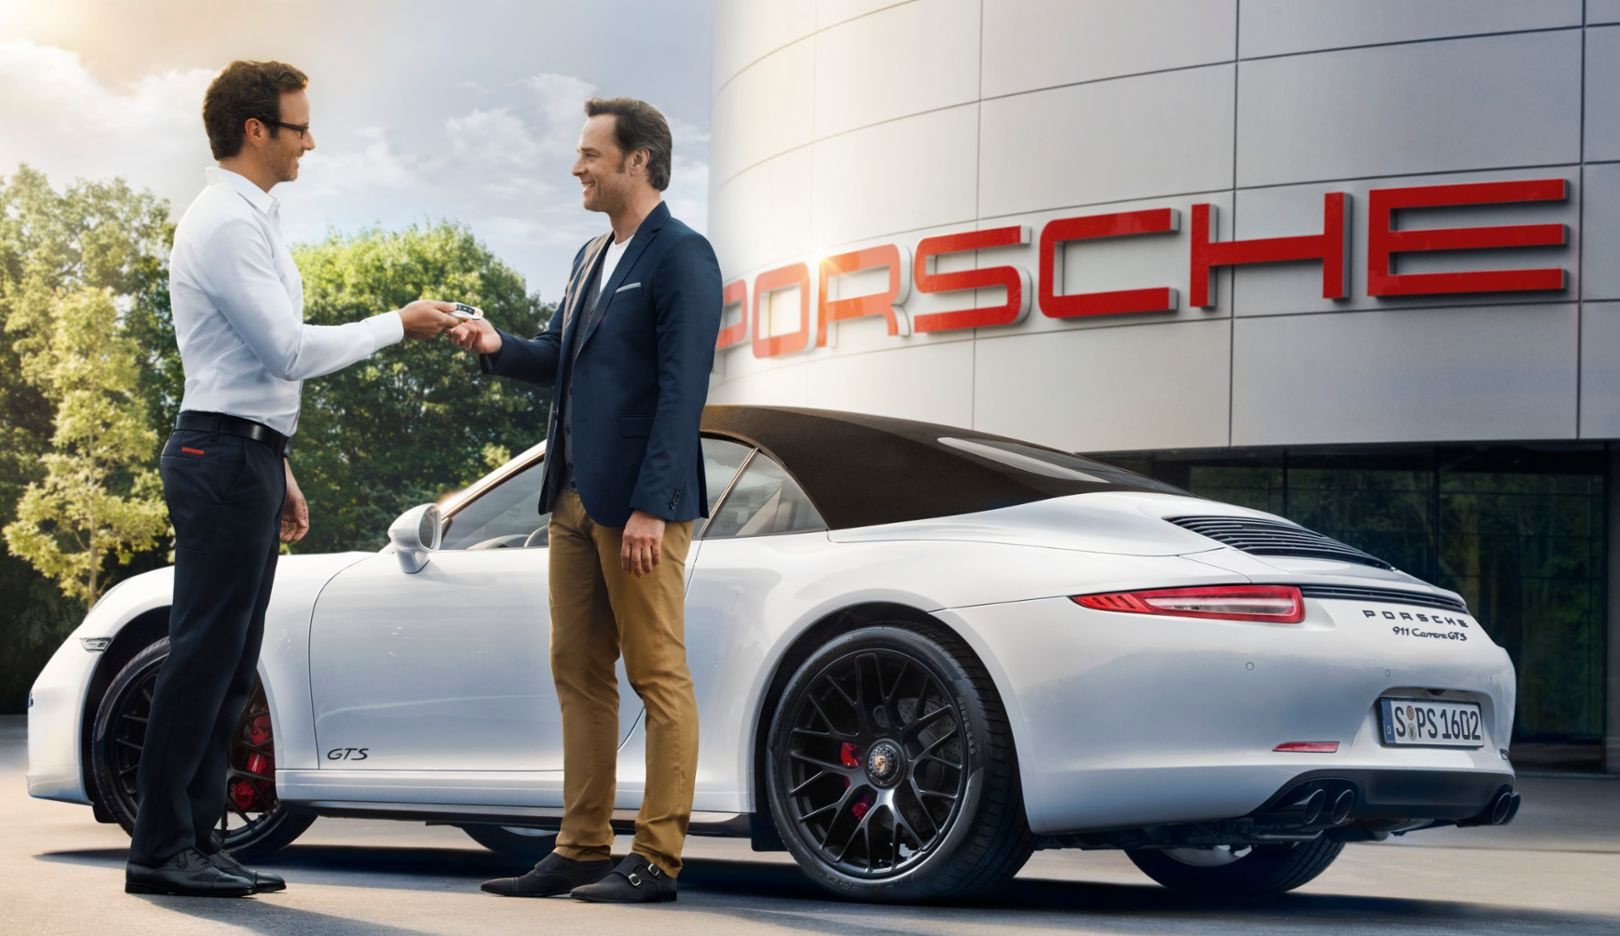 911 Carrera GTS, Porsche AG